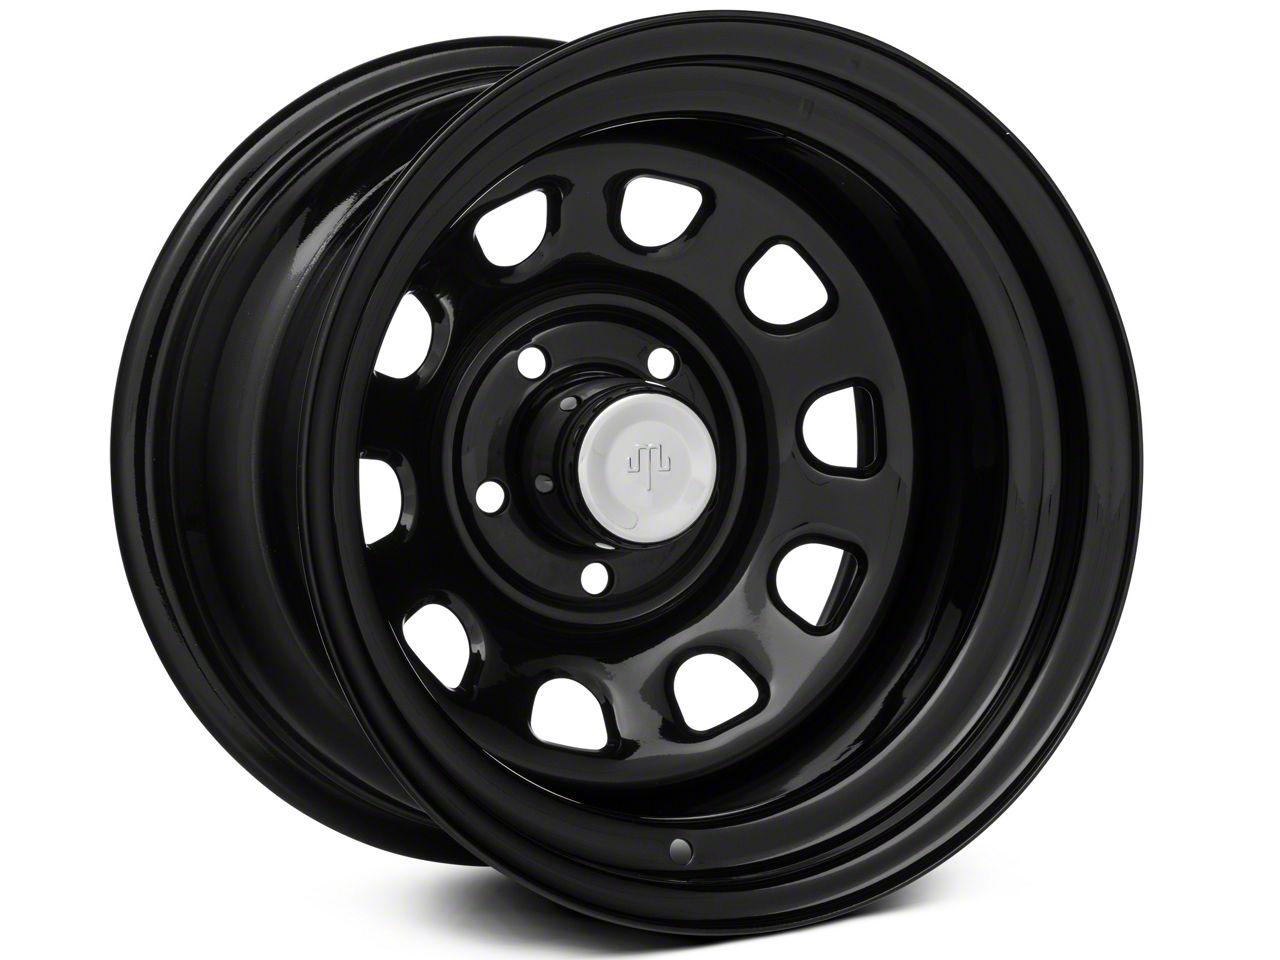 Mammoth D Window Black Steel Wheel 15x10 Wheel & Mickey Thompson Deegan 38 31x10.50R15 Tire Kit (87-06 Jeep Wrangler YJ & TJ)